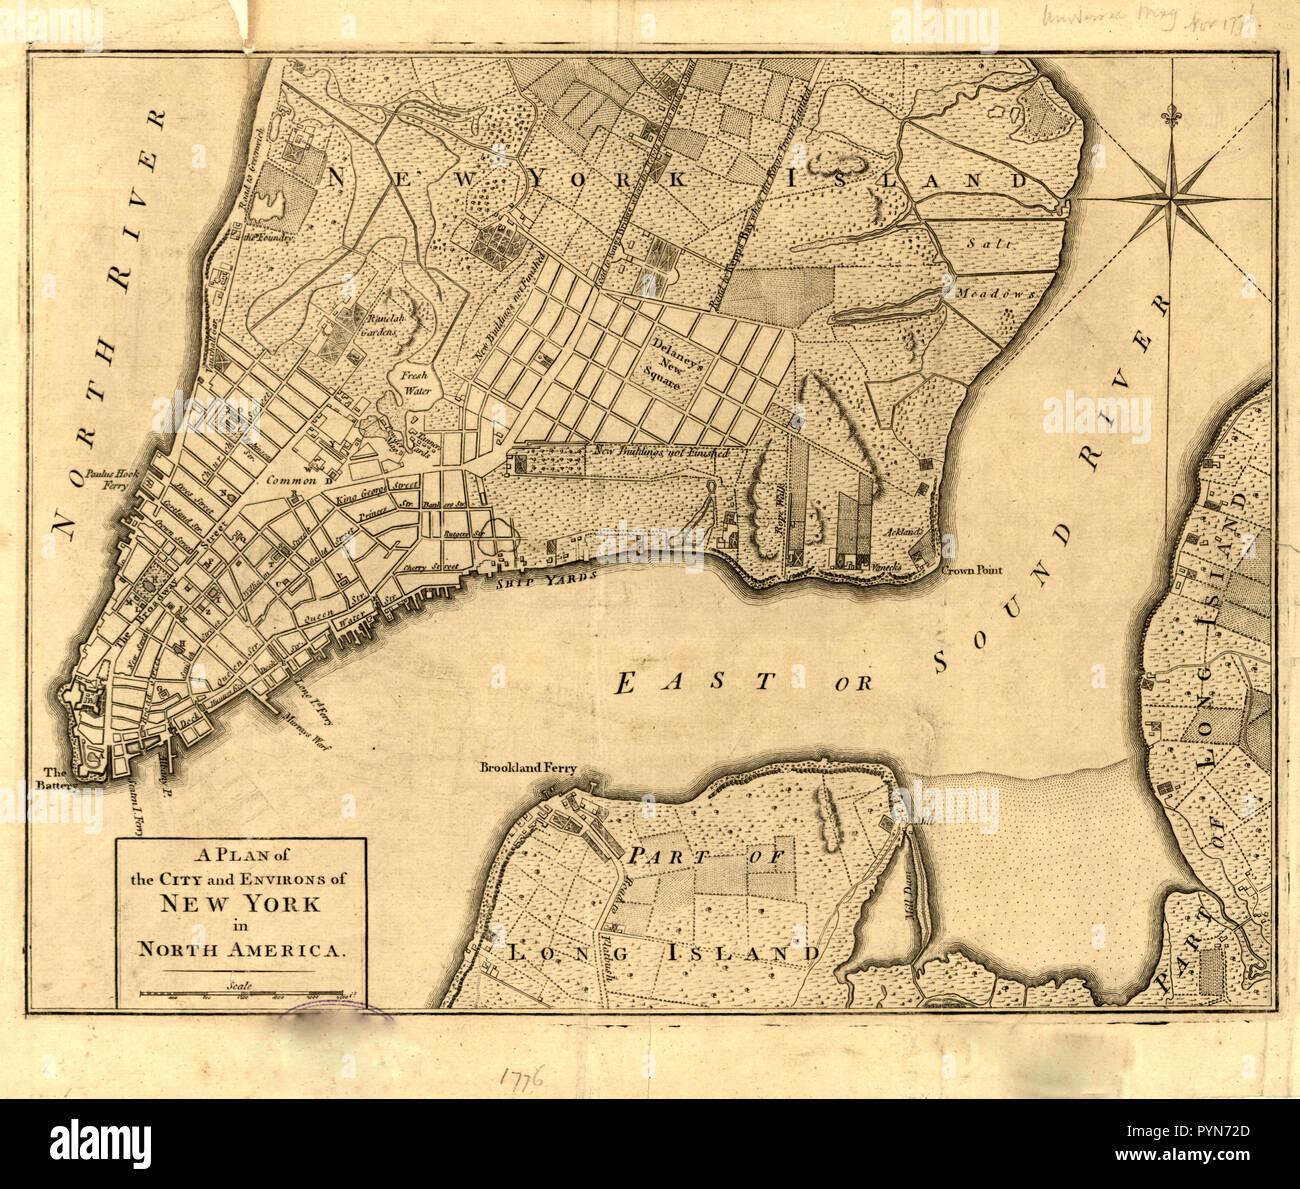 Vintage Maps / Antique Maps - New York City map ca. 1776 Stock Photo - Alamy